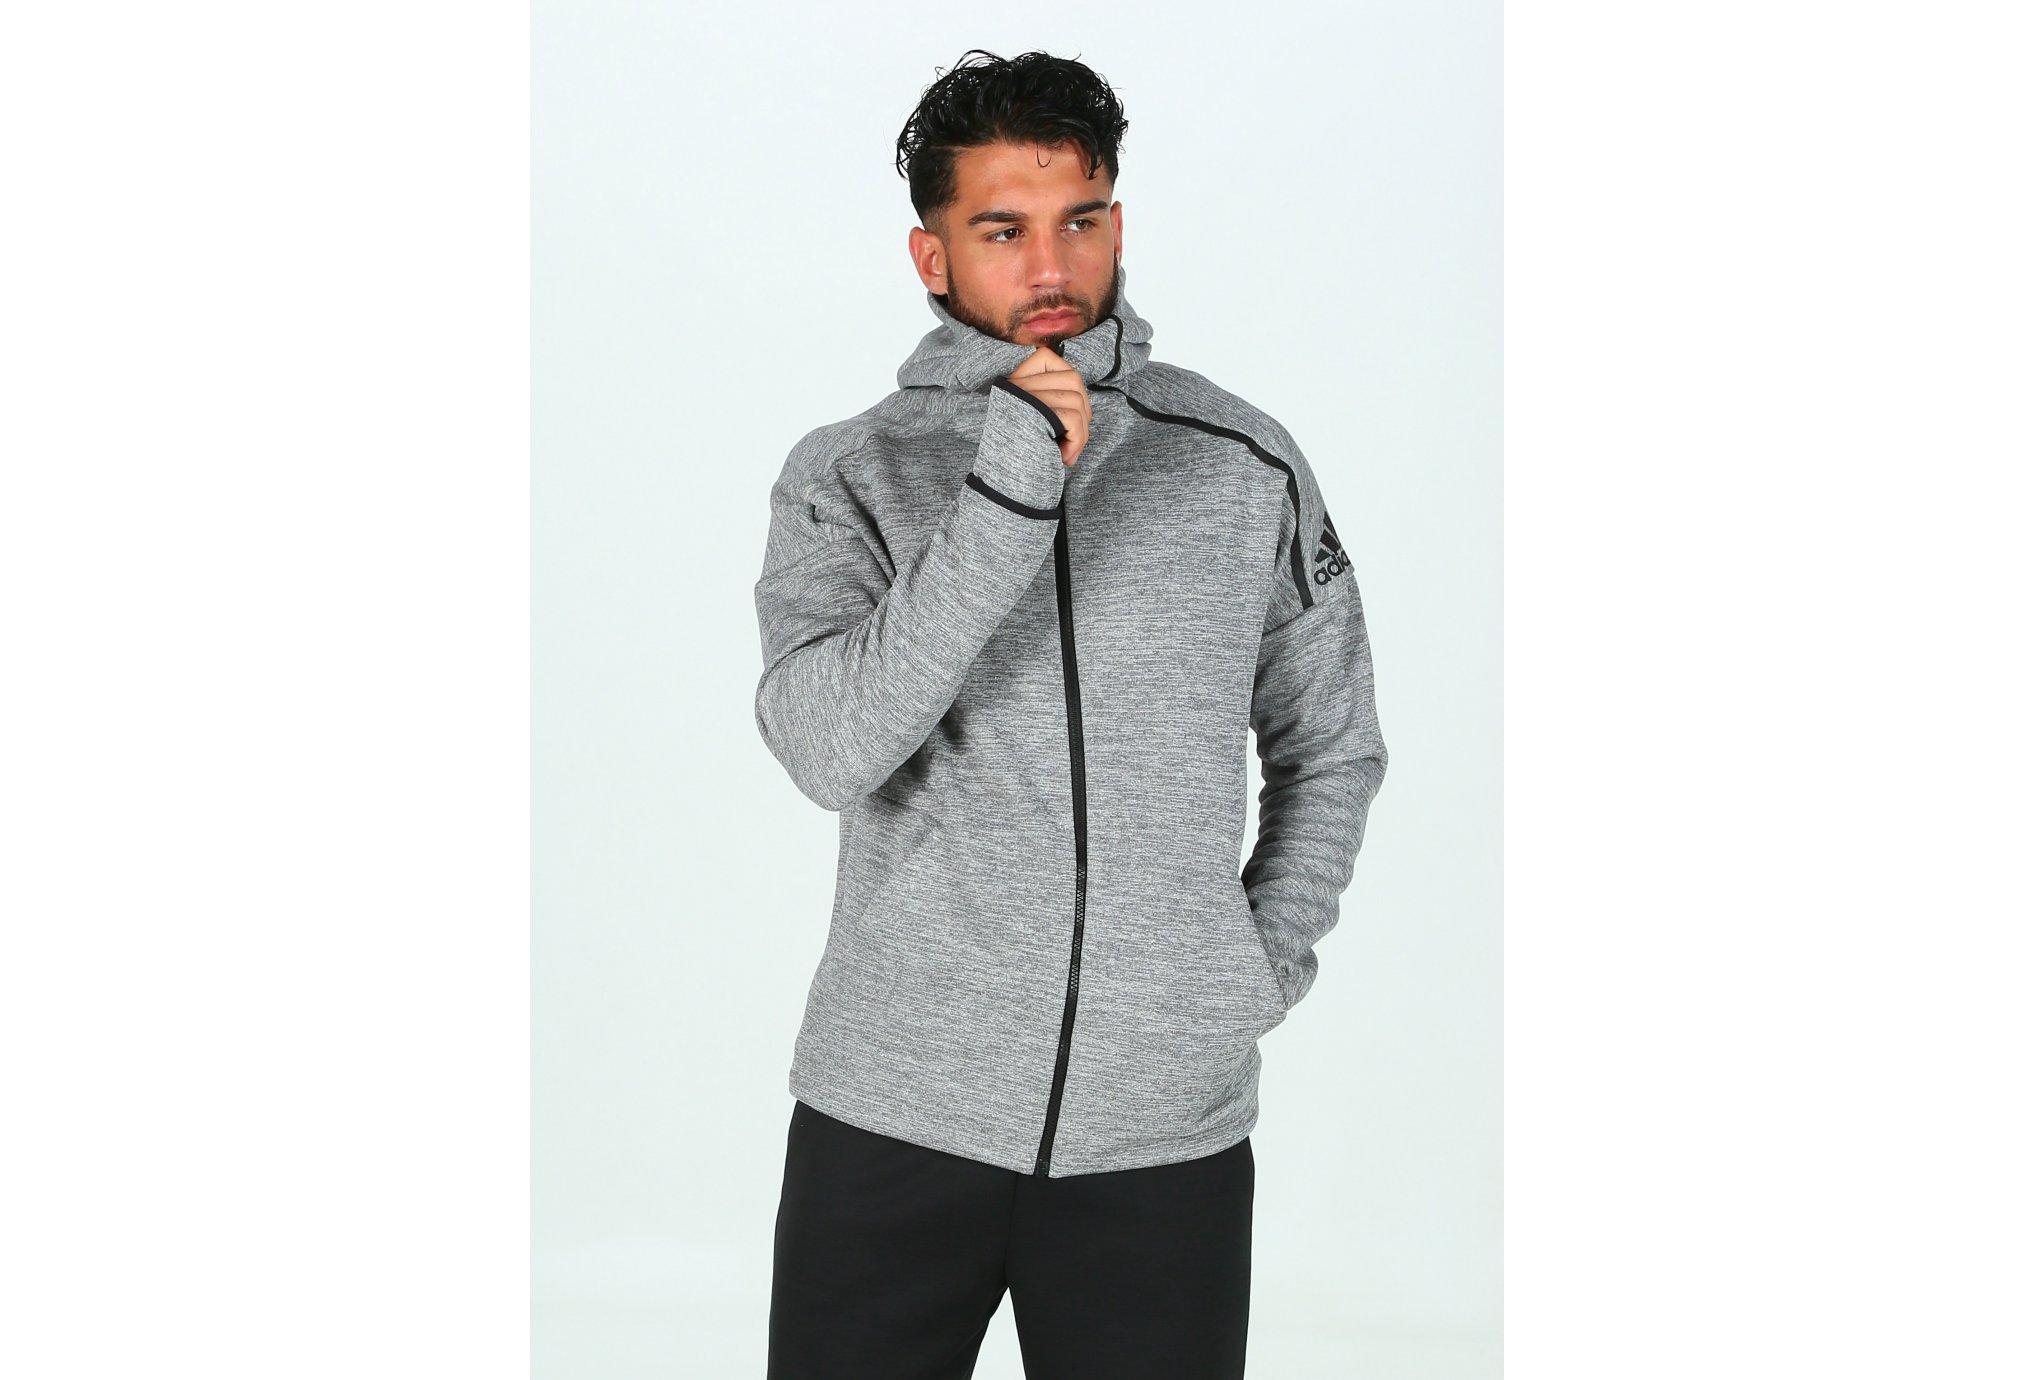 Adidas Z.N.e. fast release m vêtement running homme